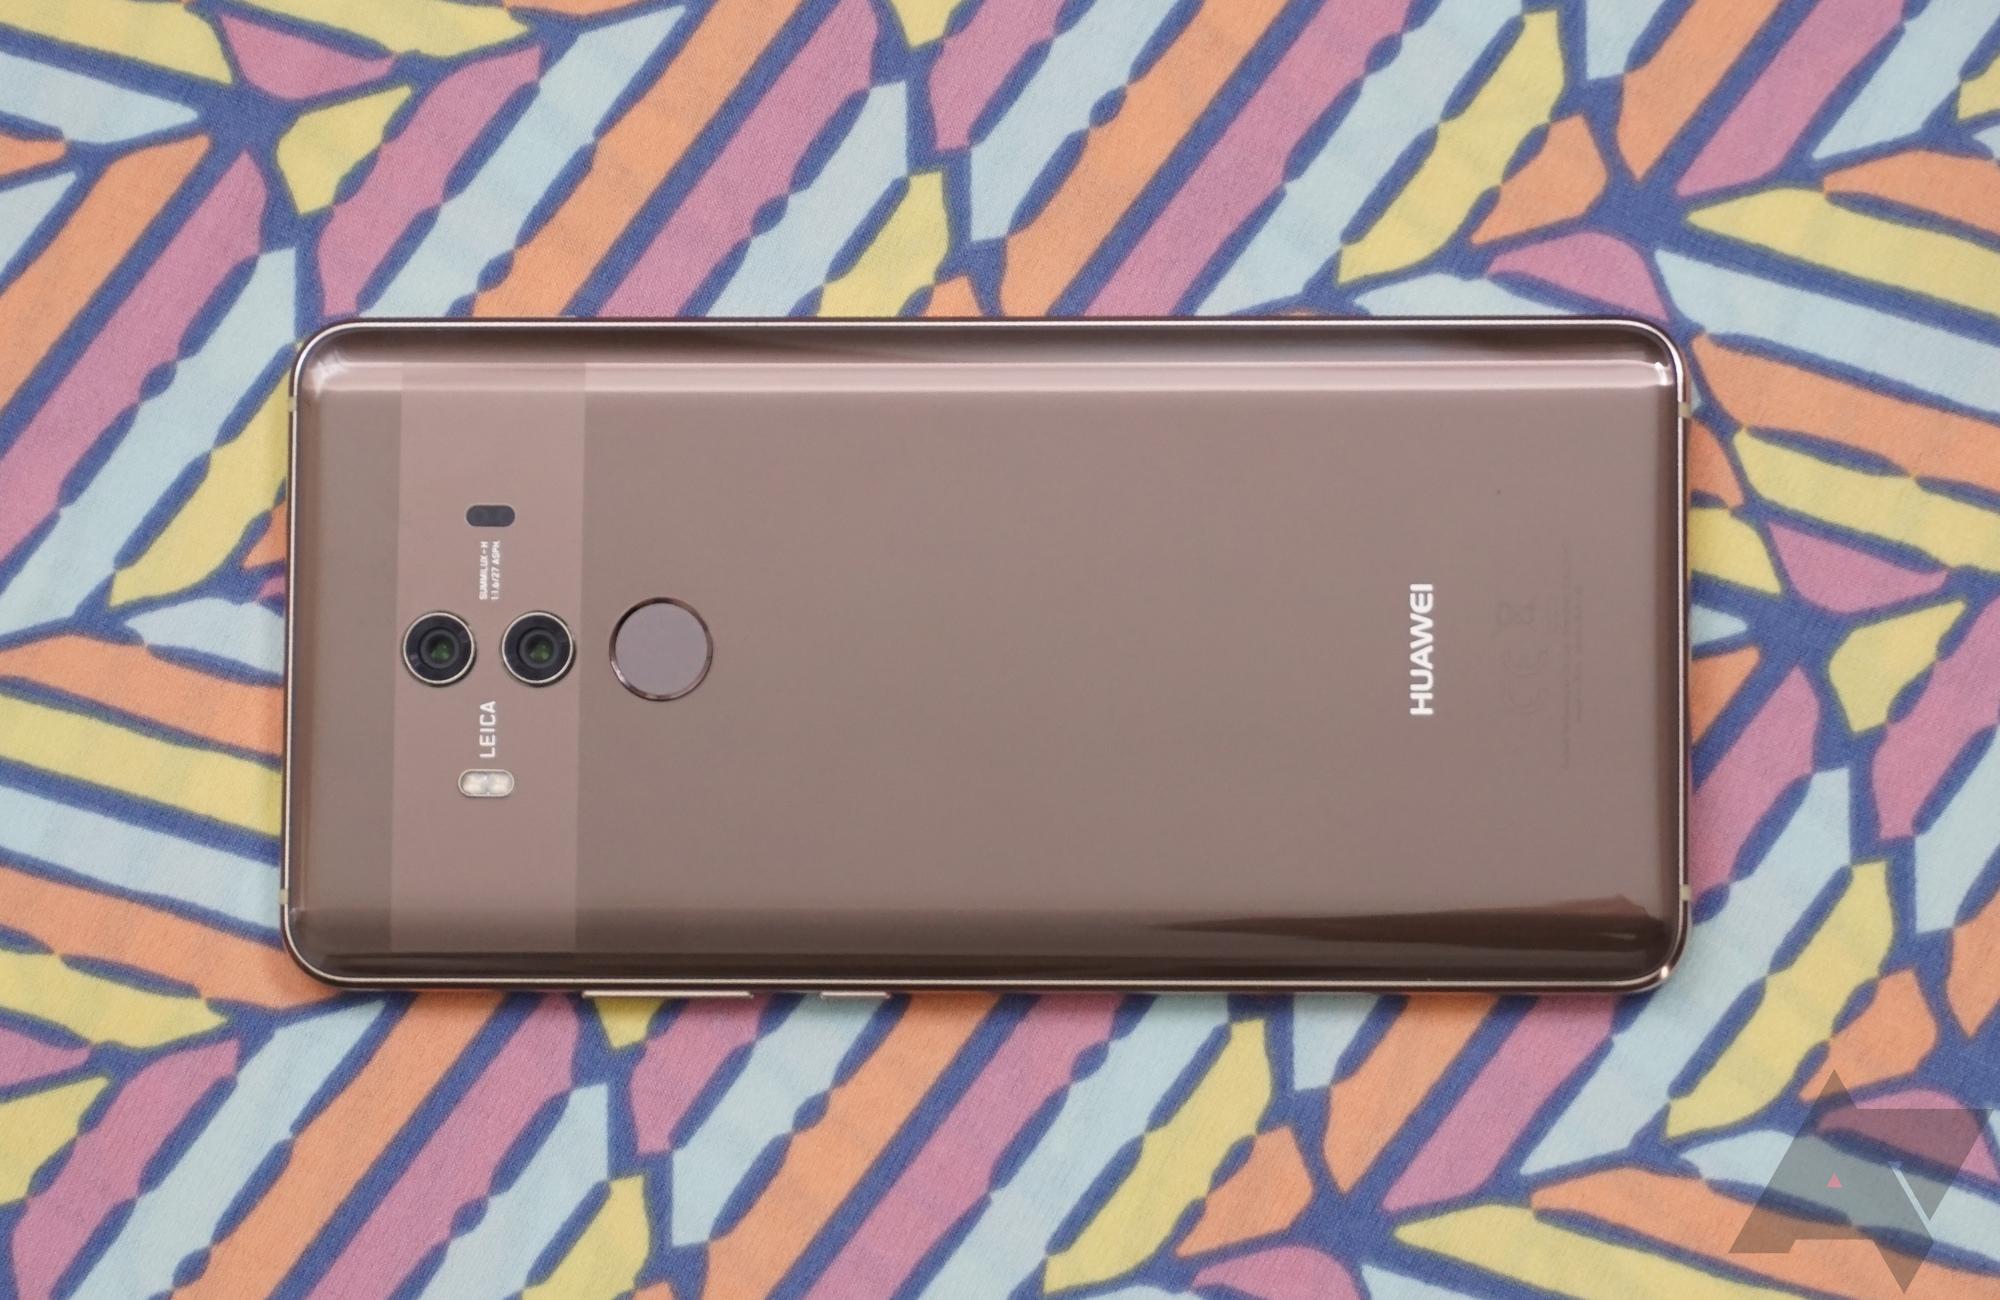 Deal Alert] Huawei Mate 10 Pro (US unlocked) on sale for